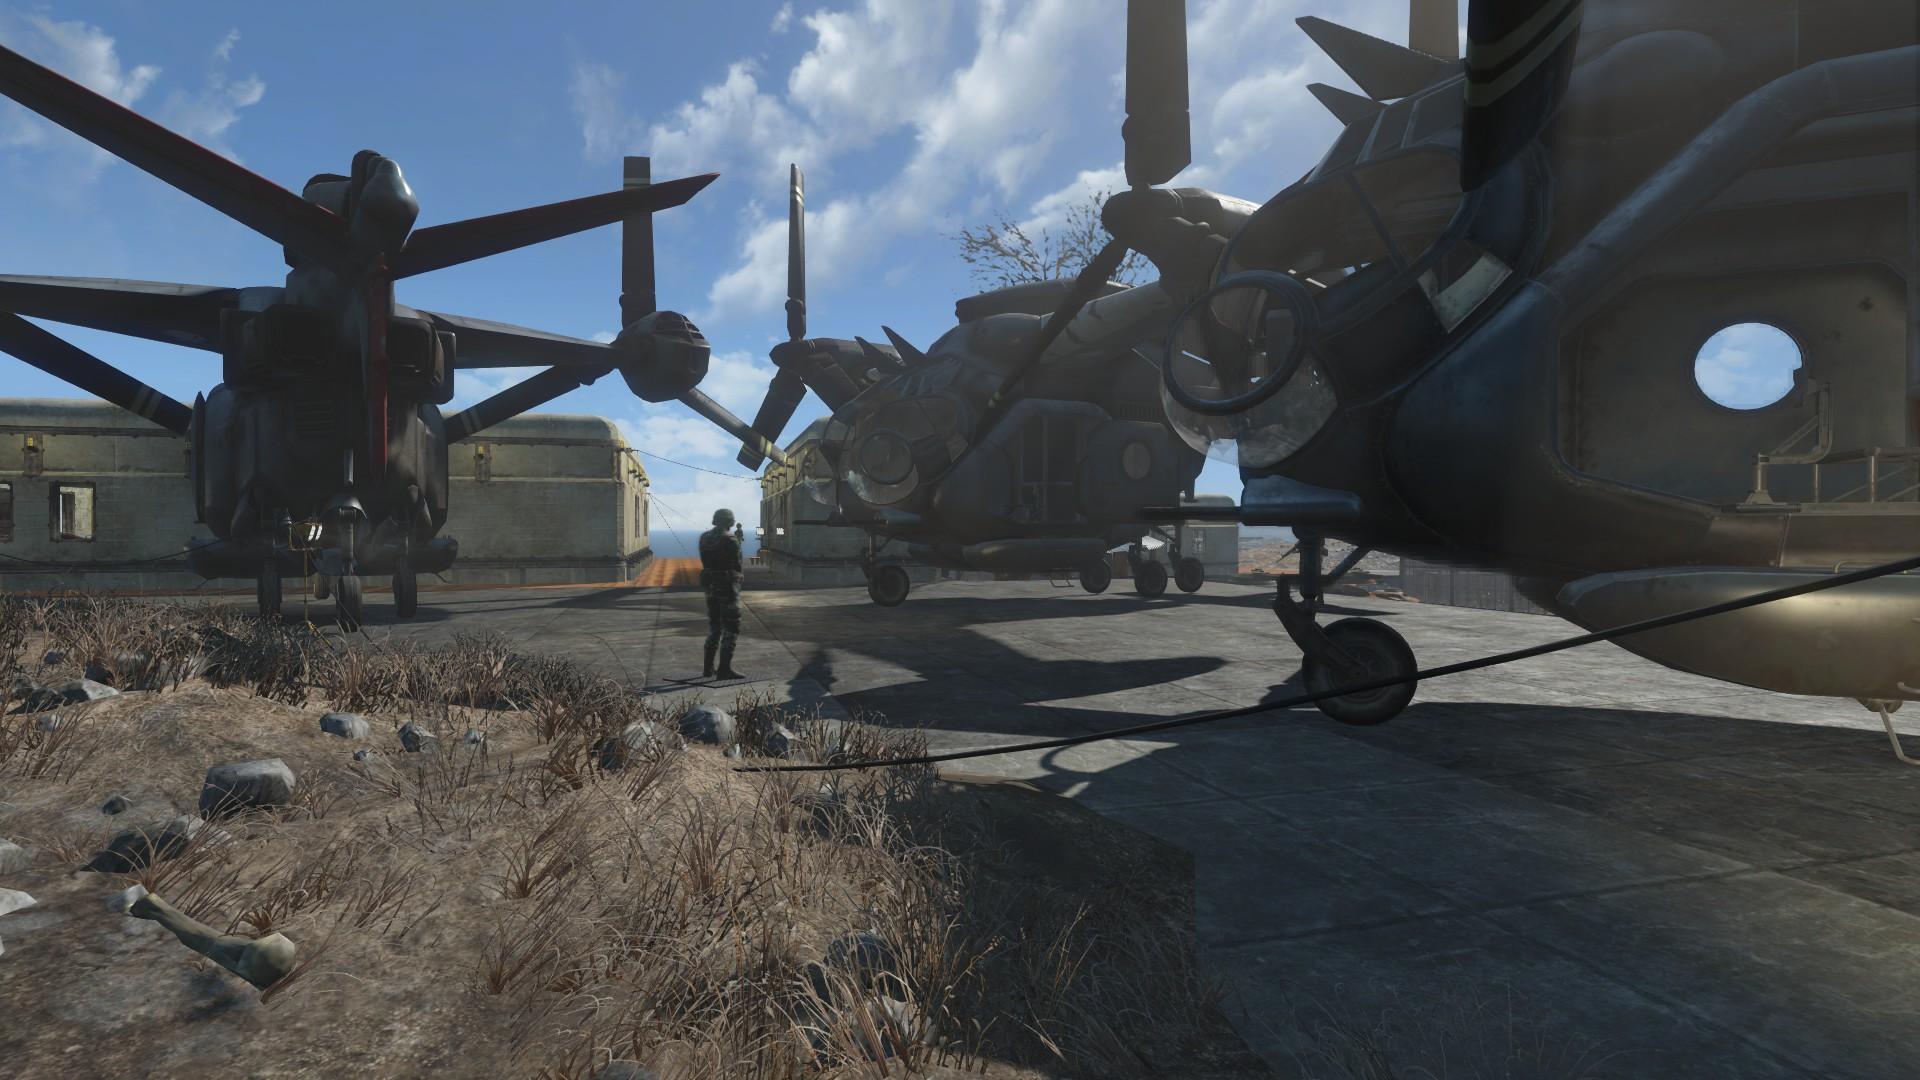 Show your Fallout 4 Settlements! 7A547FD2A88F6669925FAA2F10871F9B6EB5A7DA